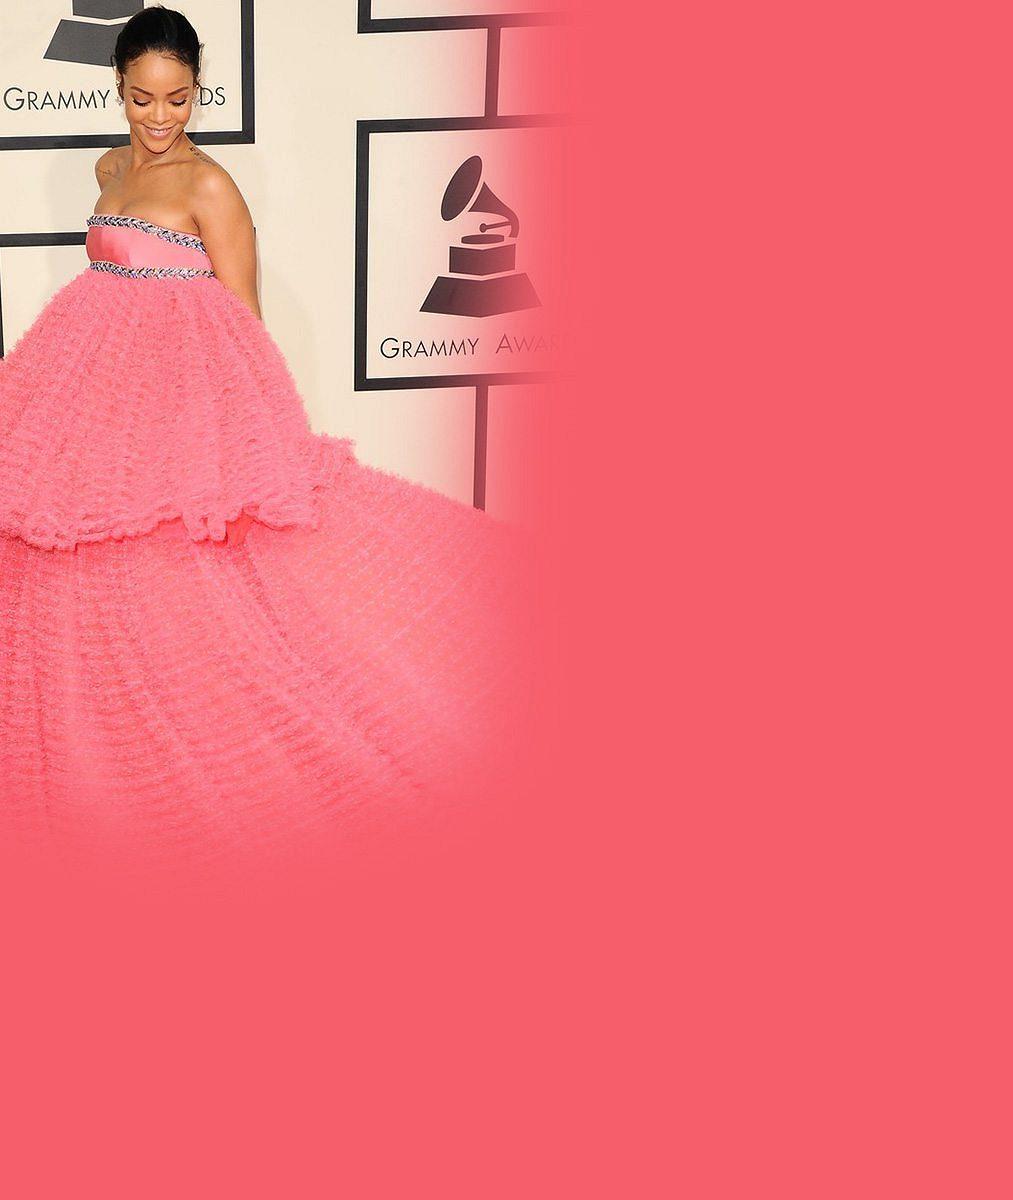 Rihanna fotila vysokou módu s ňadrem venku